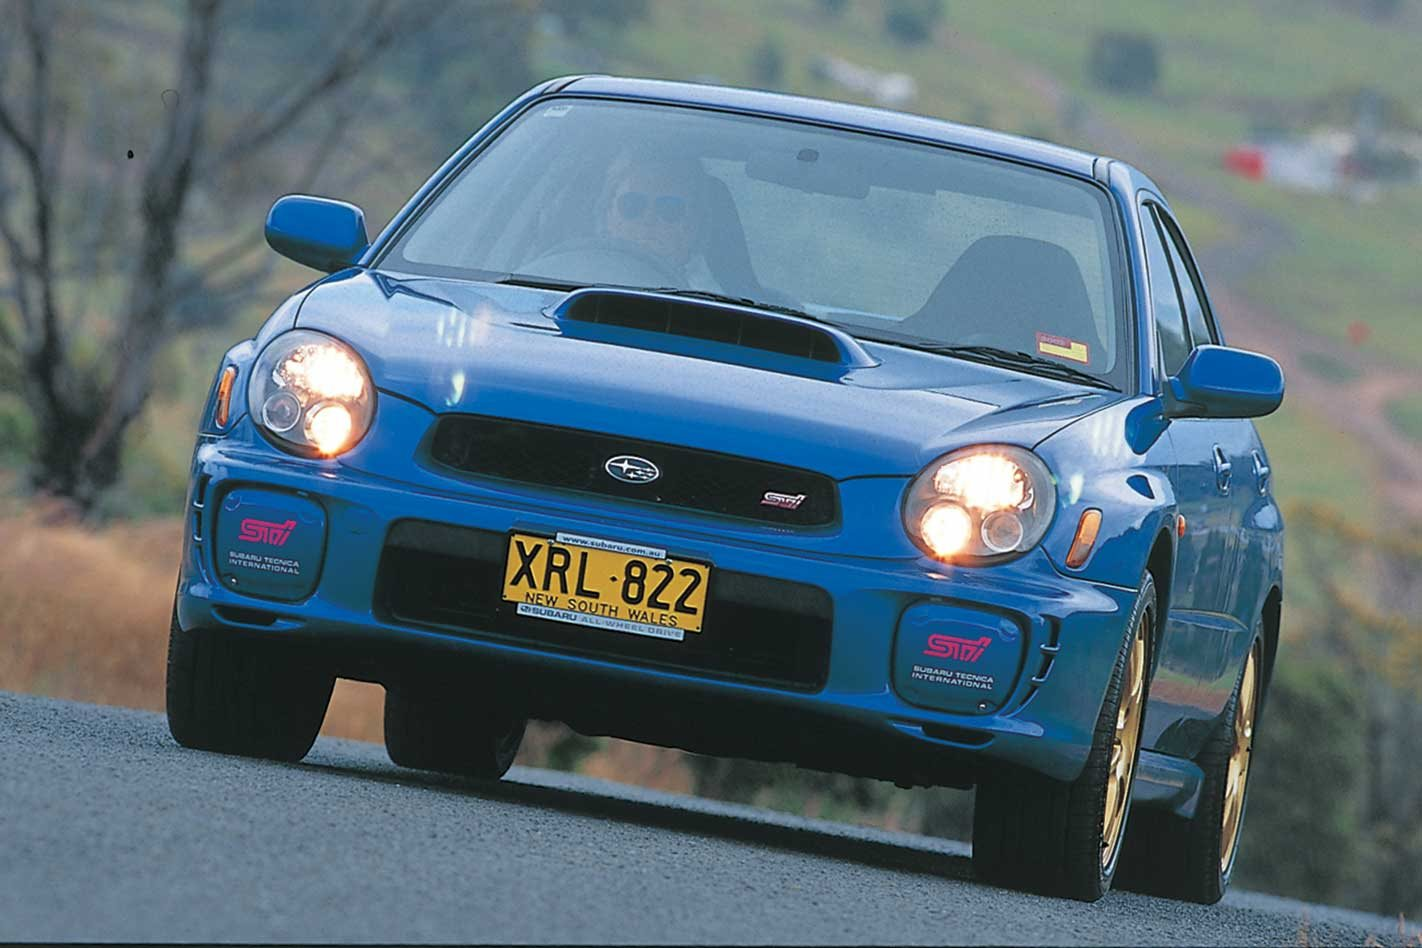 2002 Subaru Impreza Wrx Sti Used Car Review